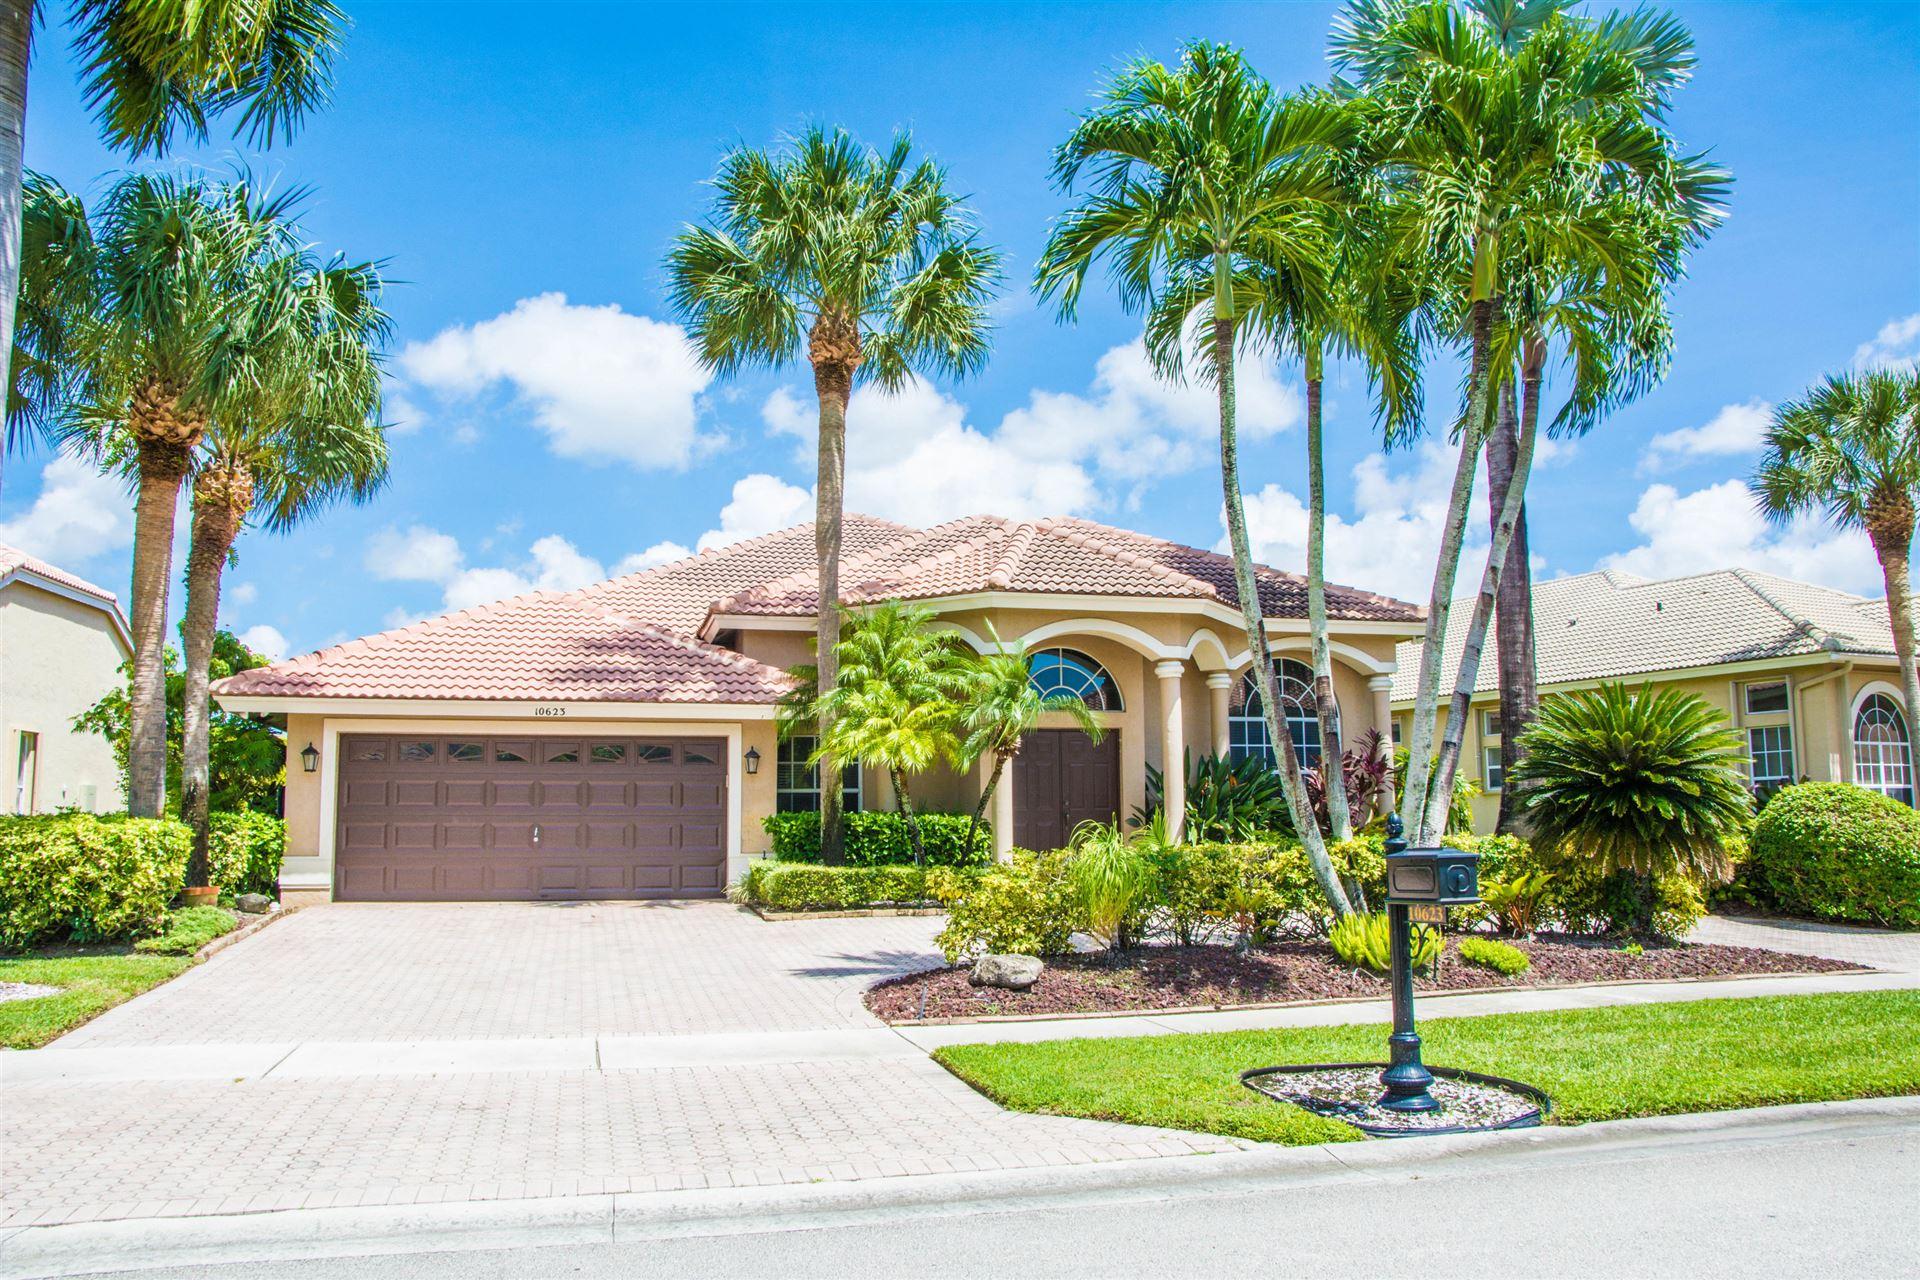 Photo of 10623 Saint Thomas Drive, Boca Raton, FL 33498 (MLS # RX-10656543)